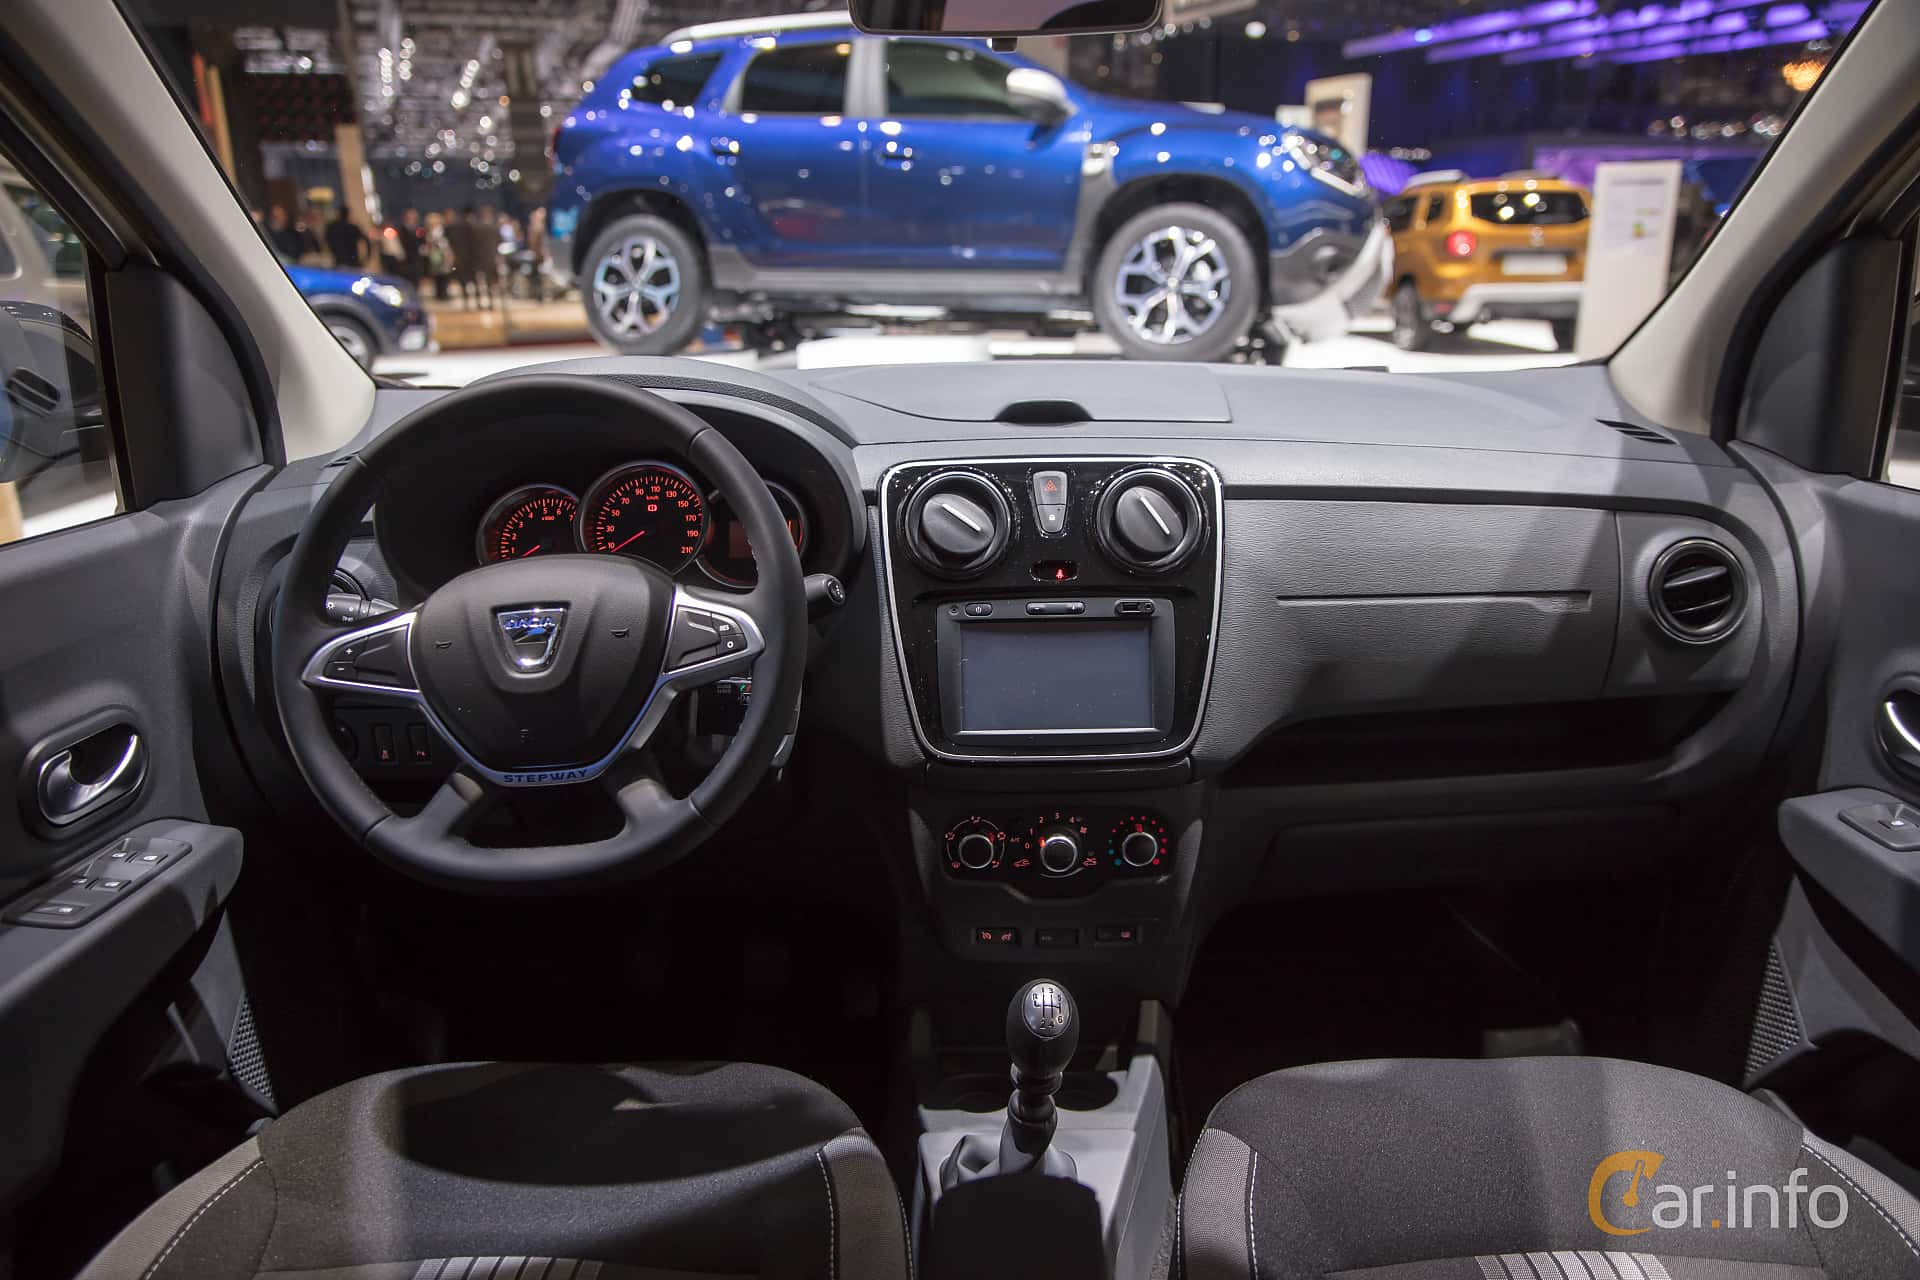 Dacia Lodgy Stepway 1.5 dCi Manual, 107hp, 2018